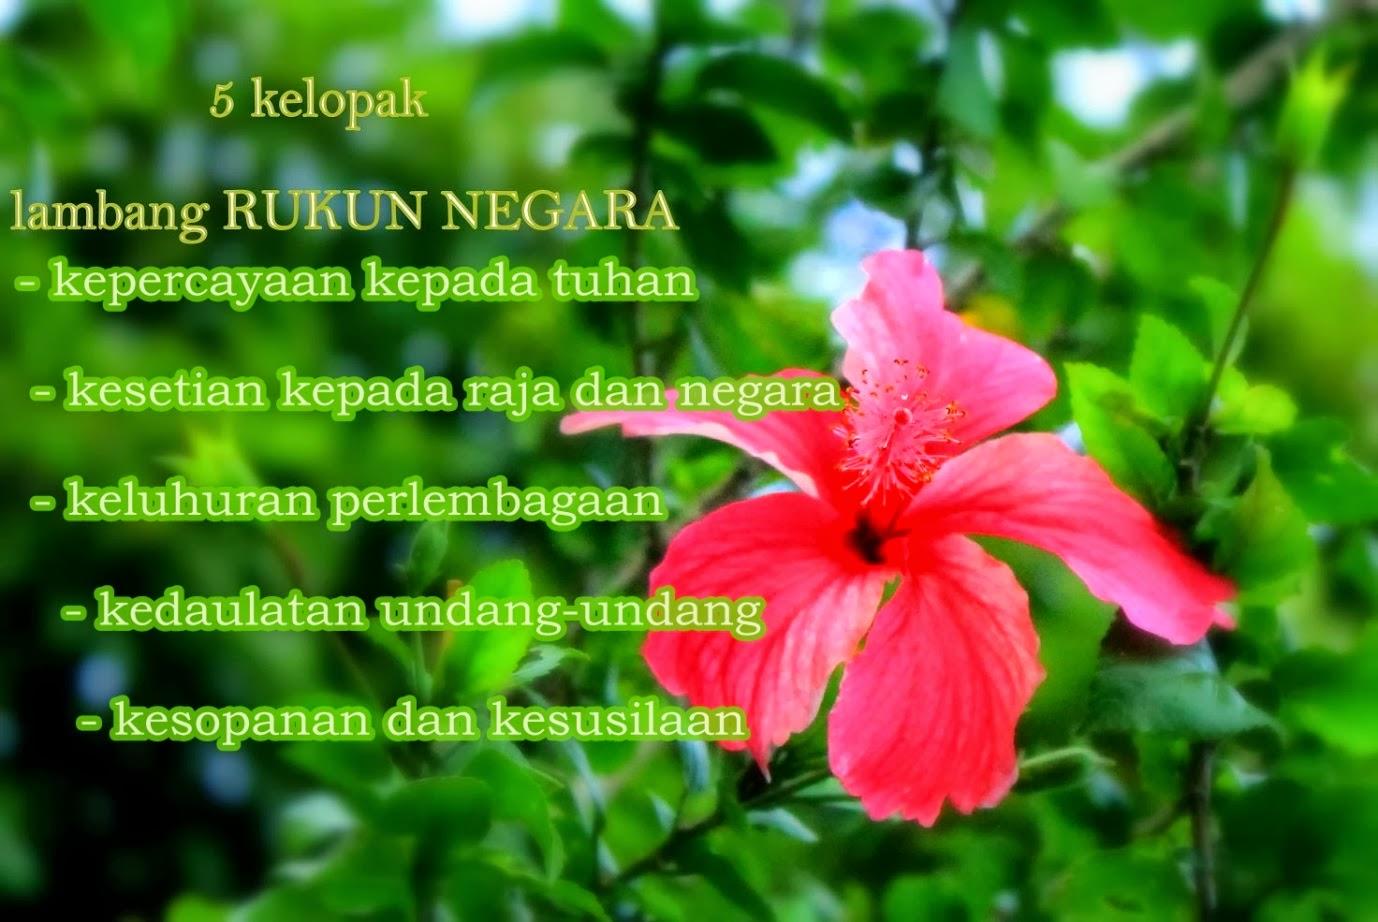 Lukisan Bunga Raya Bunga Kebangsaan Malaysia Cikimm Com